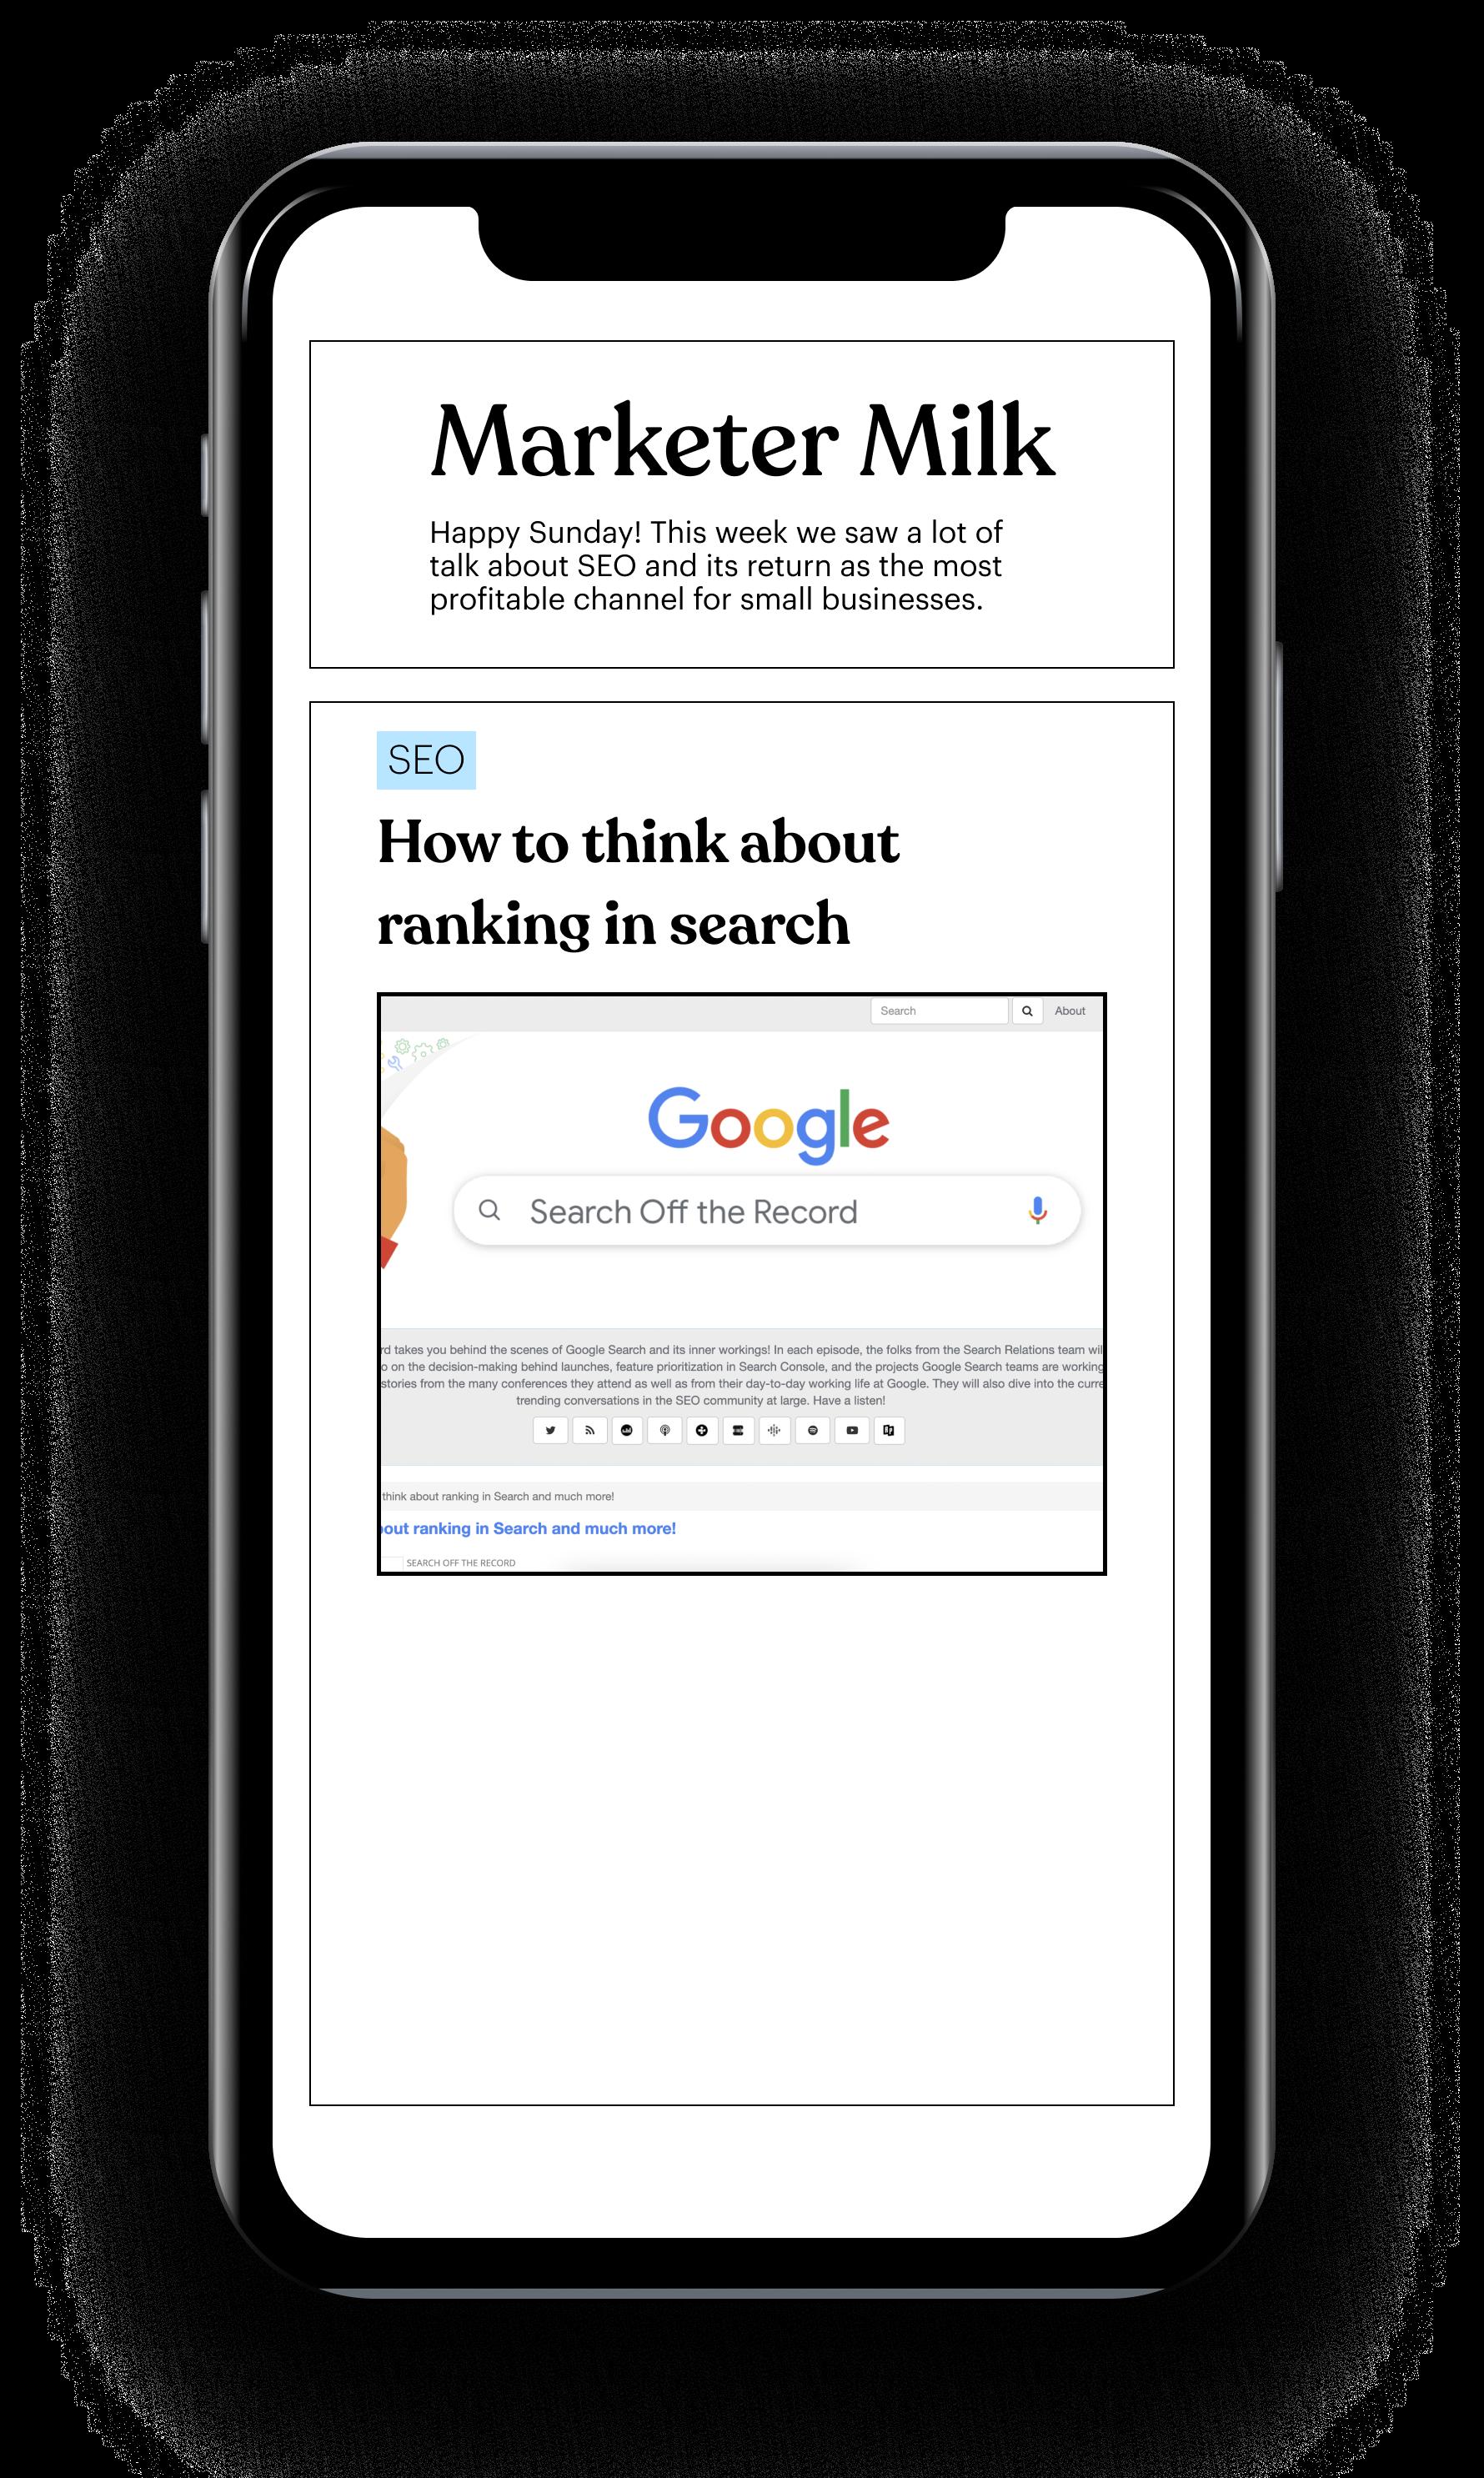 Marketer Milk newsletter on iPhone